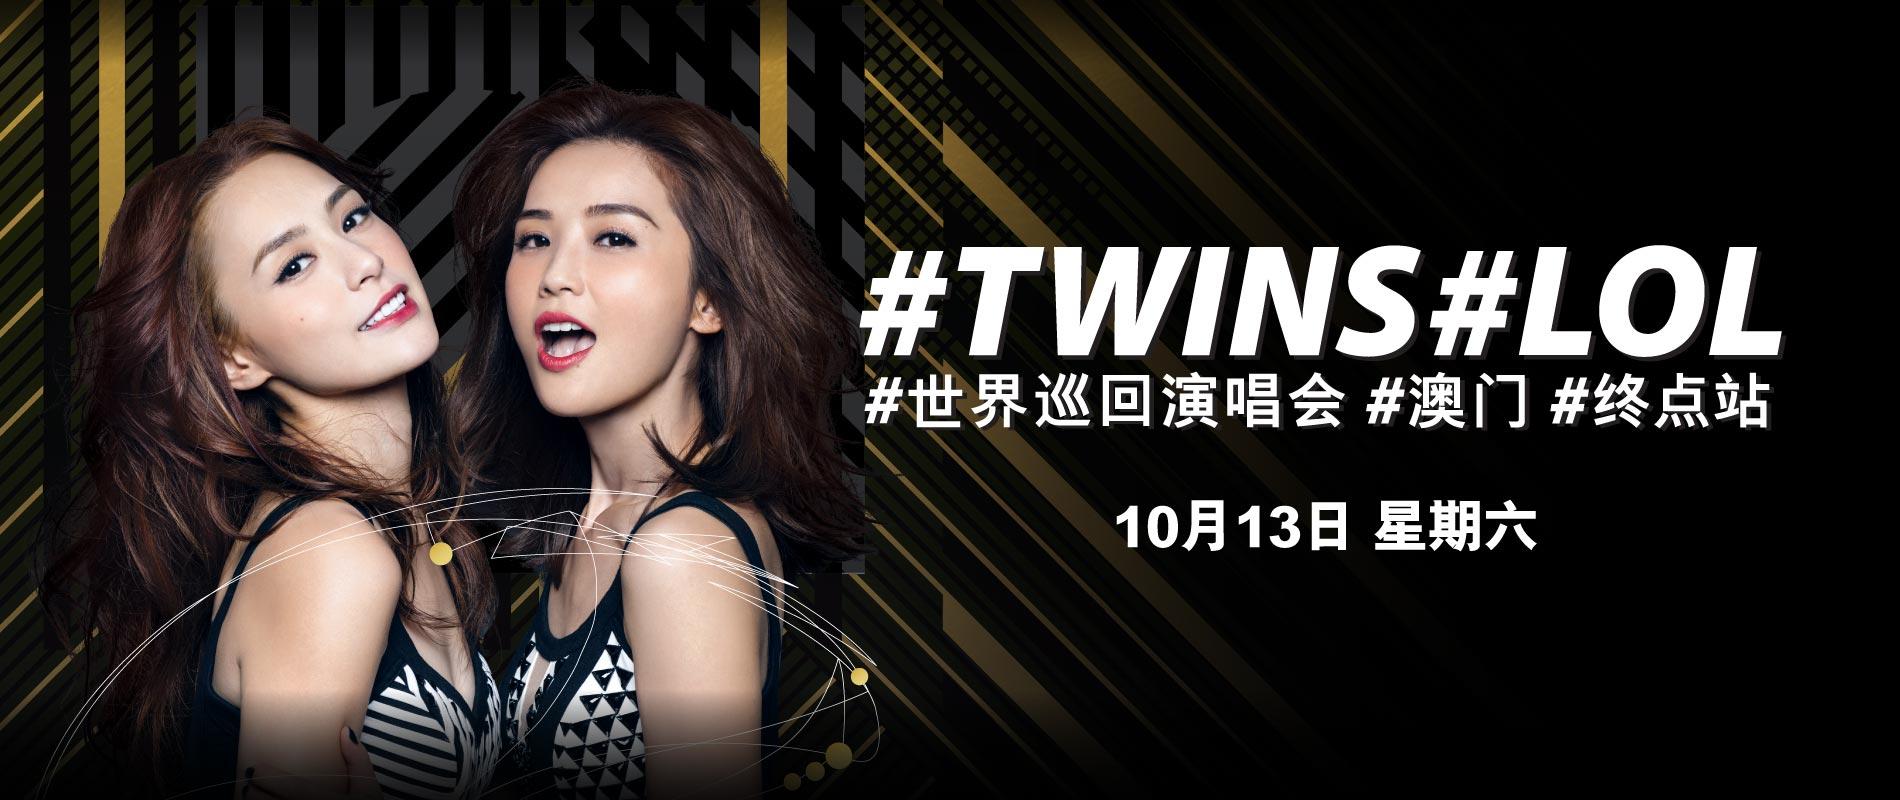 #TWINS #LOL #世界巡迴演唱会- 澳门威尼斯人金光综艺馆